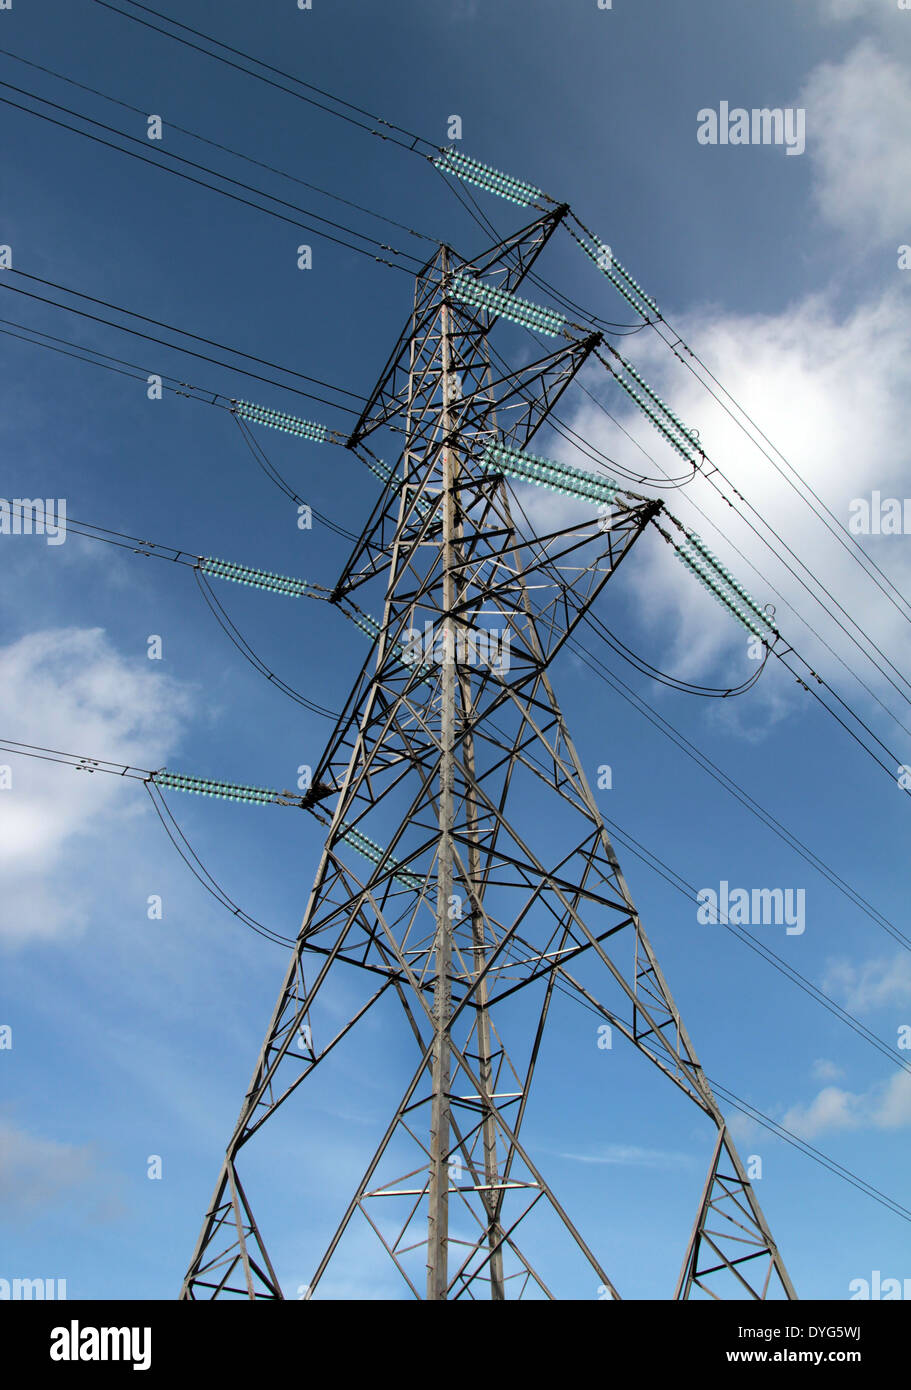 An electricity pylon against a blue sky. - Stock Image